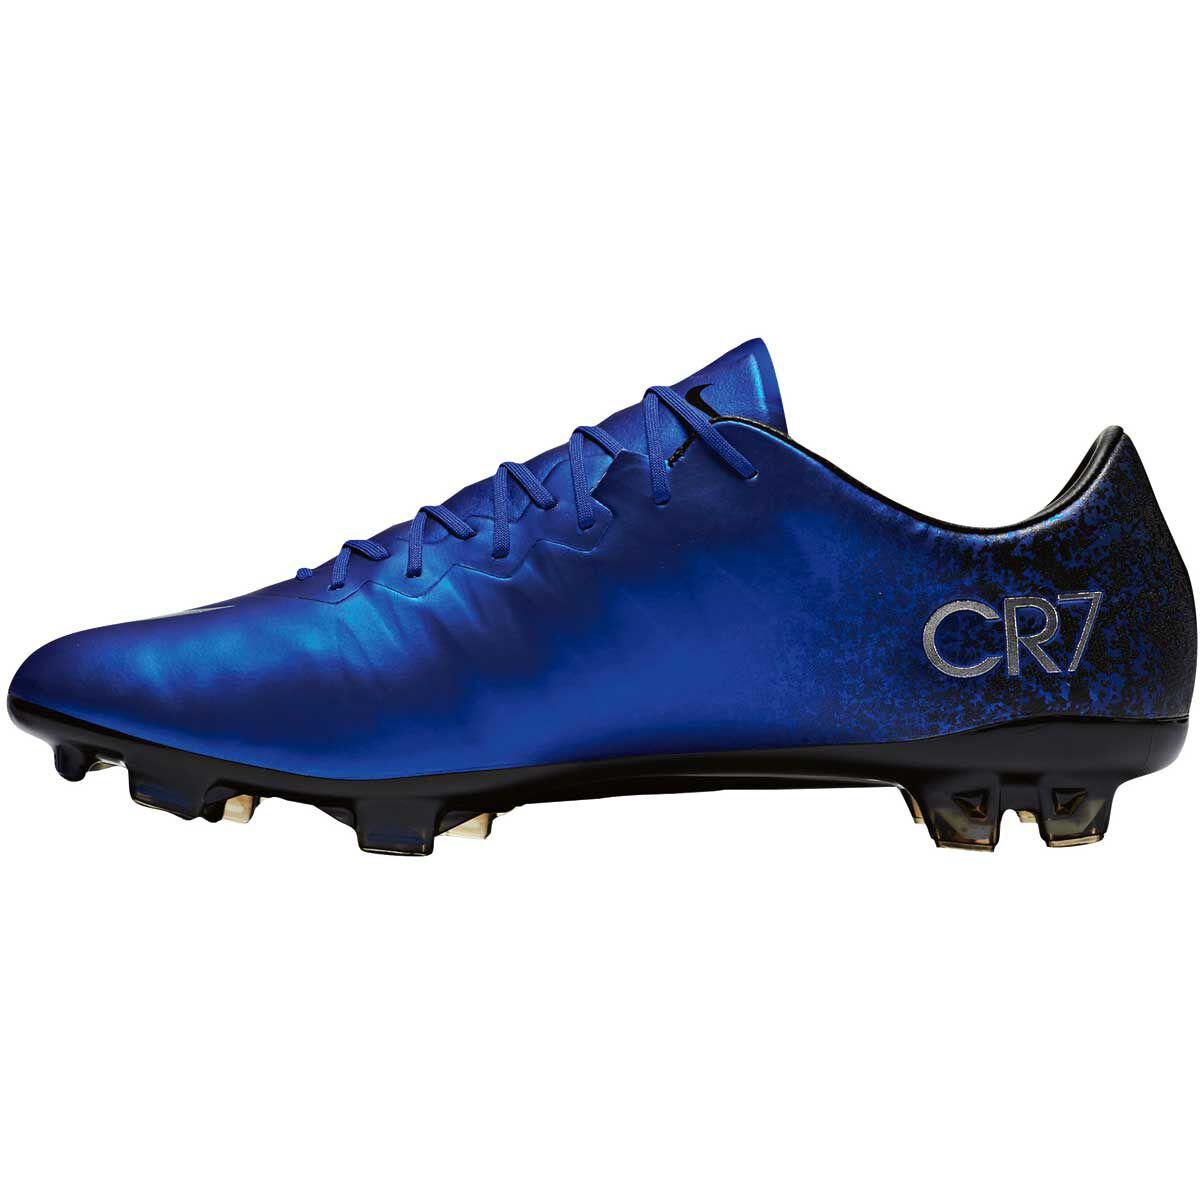 e57f282274b4 ... ireland nike mercurial vapor x cr7 mens football boots blue silver us 8  adult blue db067